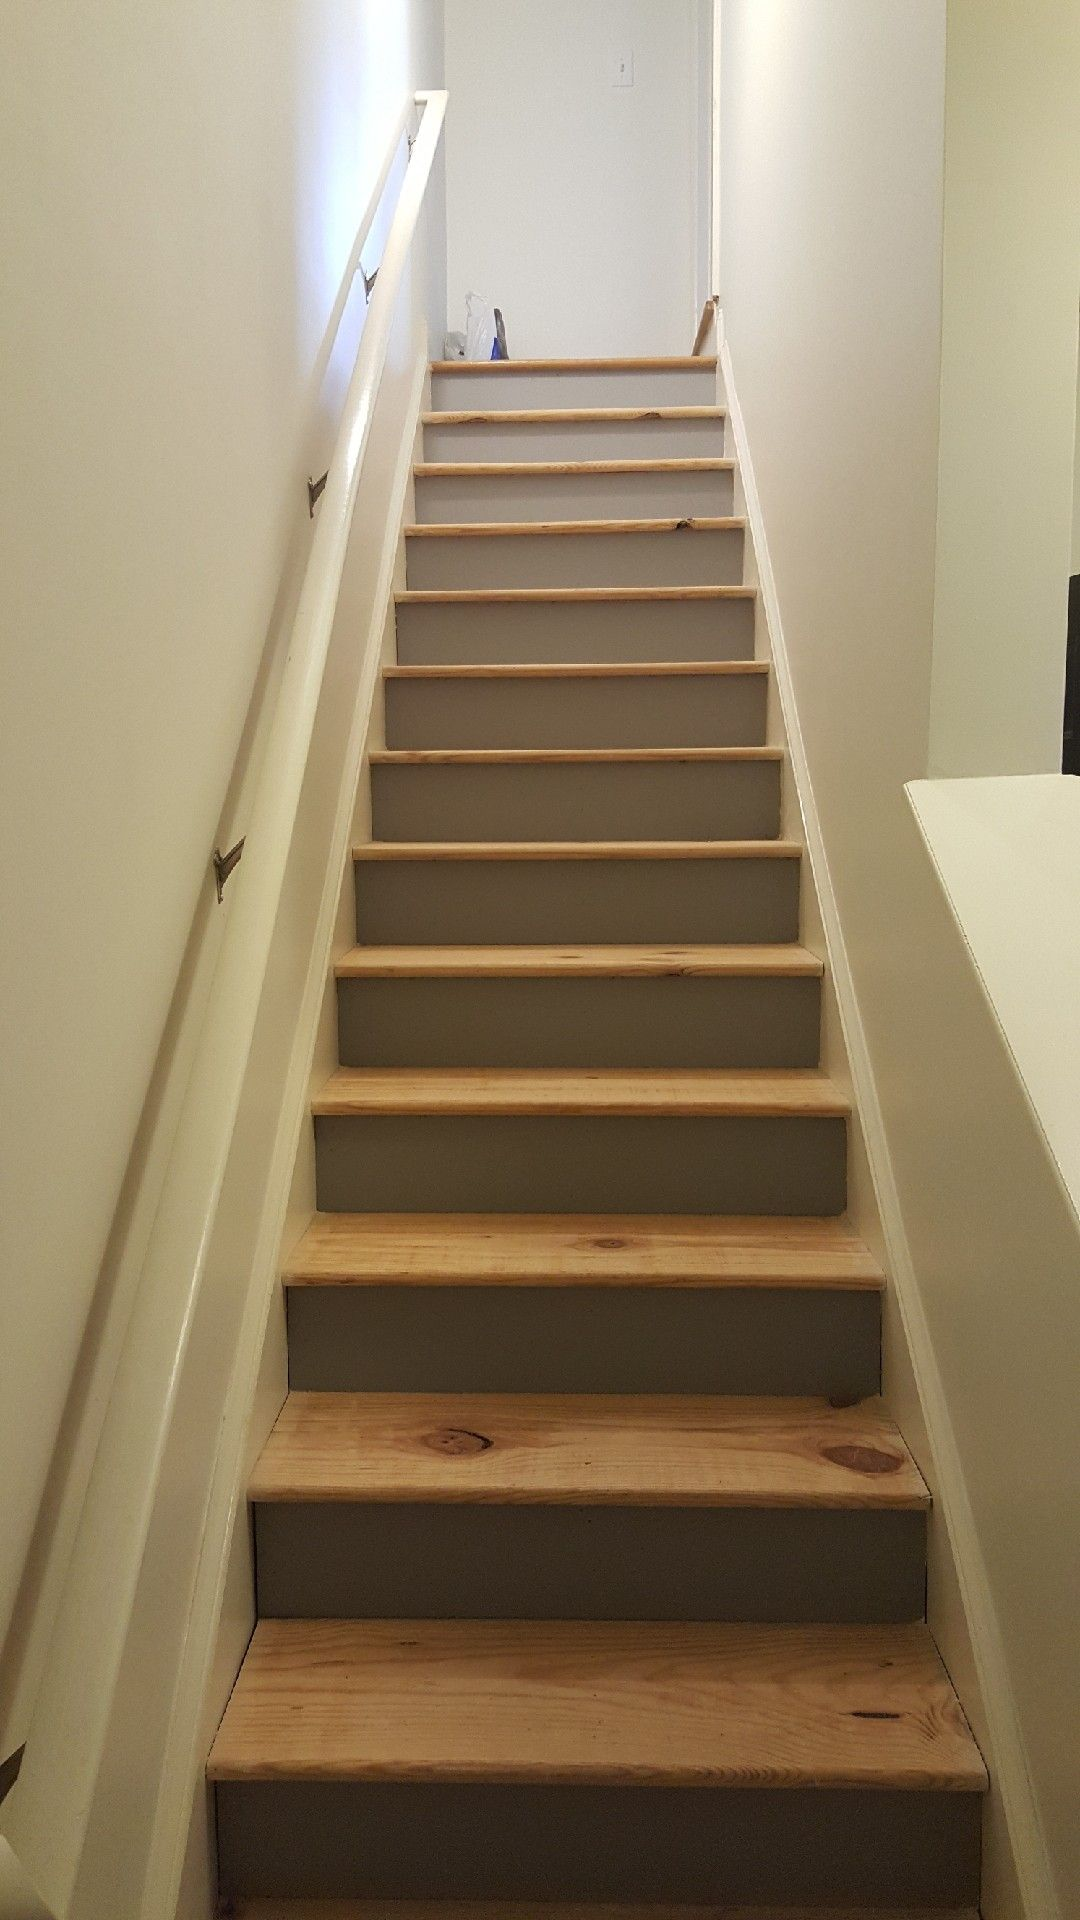 my own diy basement stair makeover diy pinterest stair makeover